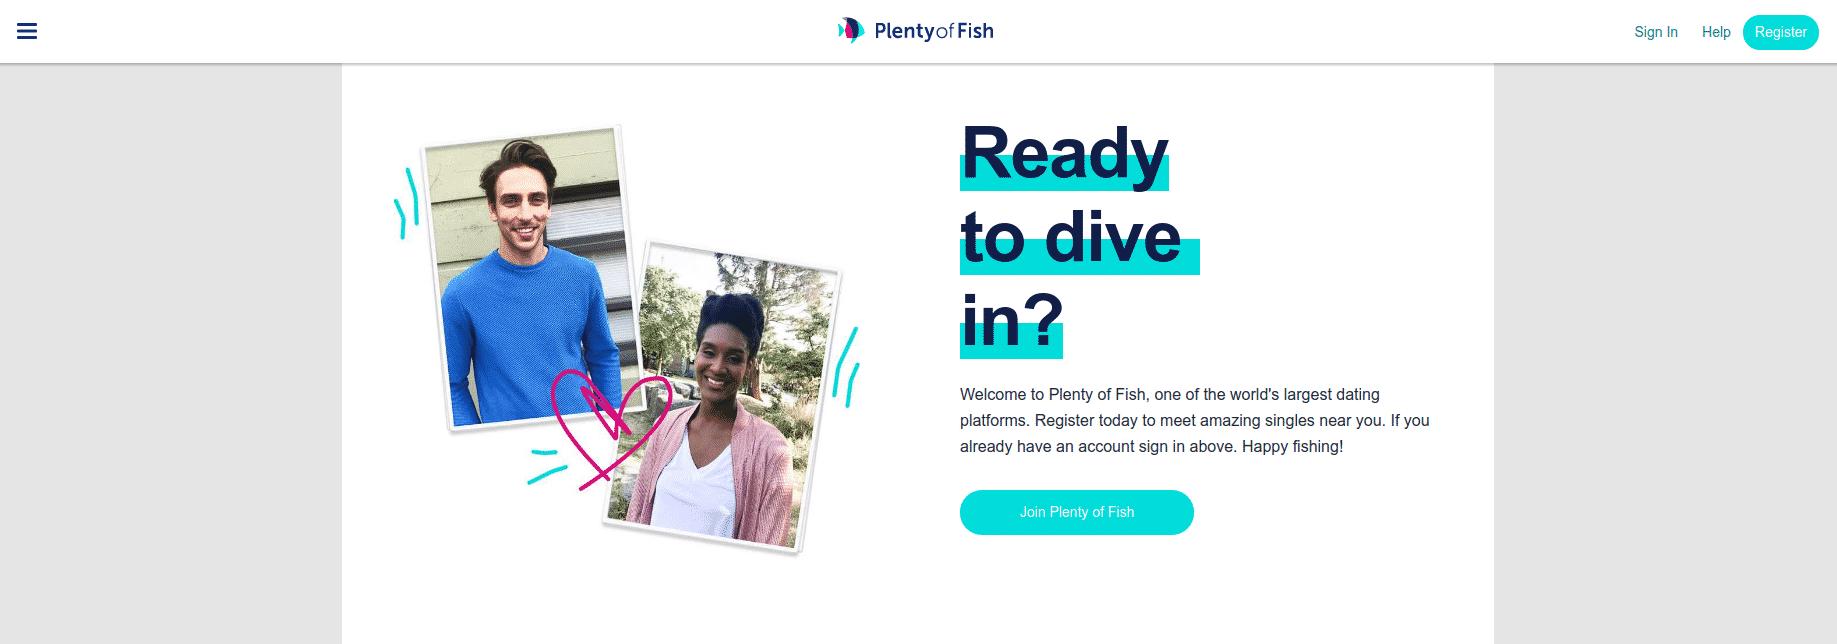 POF (Plenty of Fish) Review1